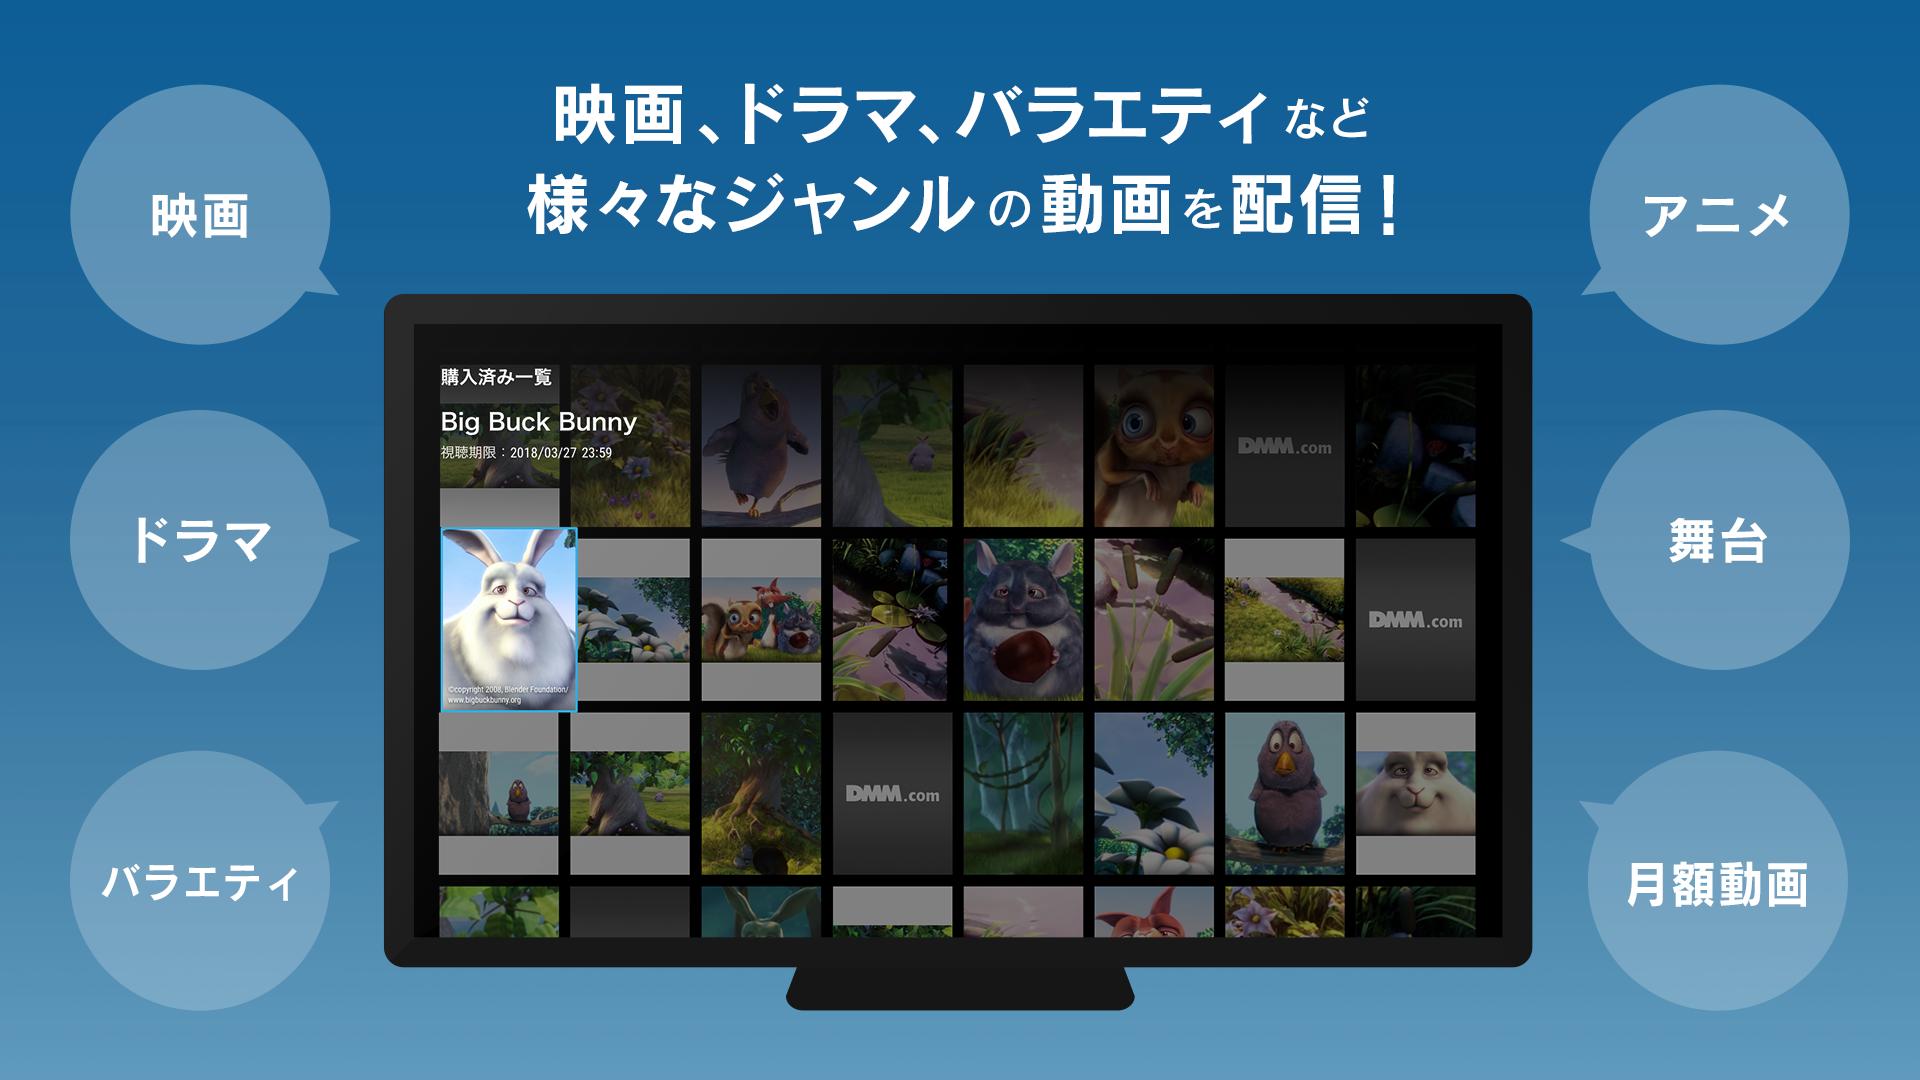 dmm 動画 テレビ 出力